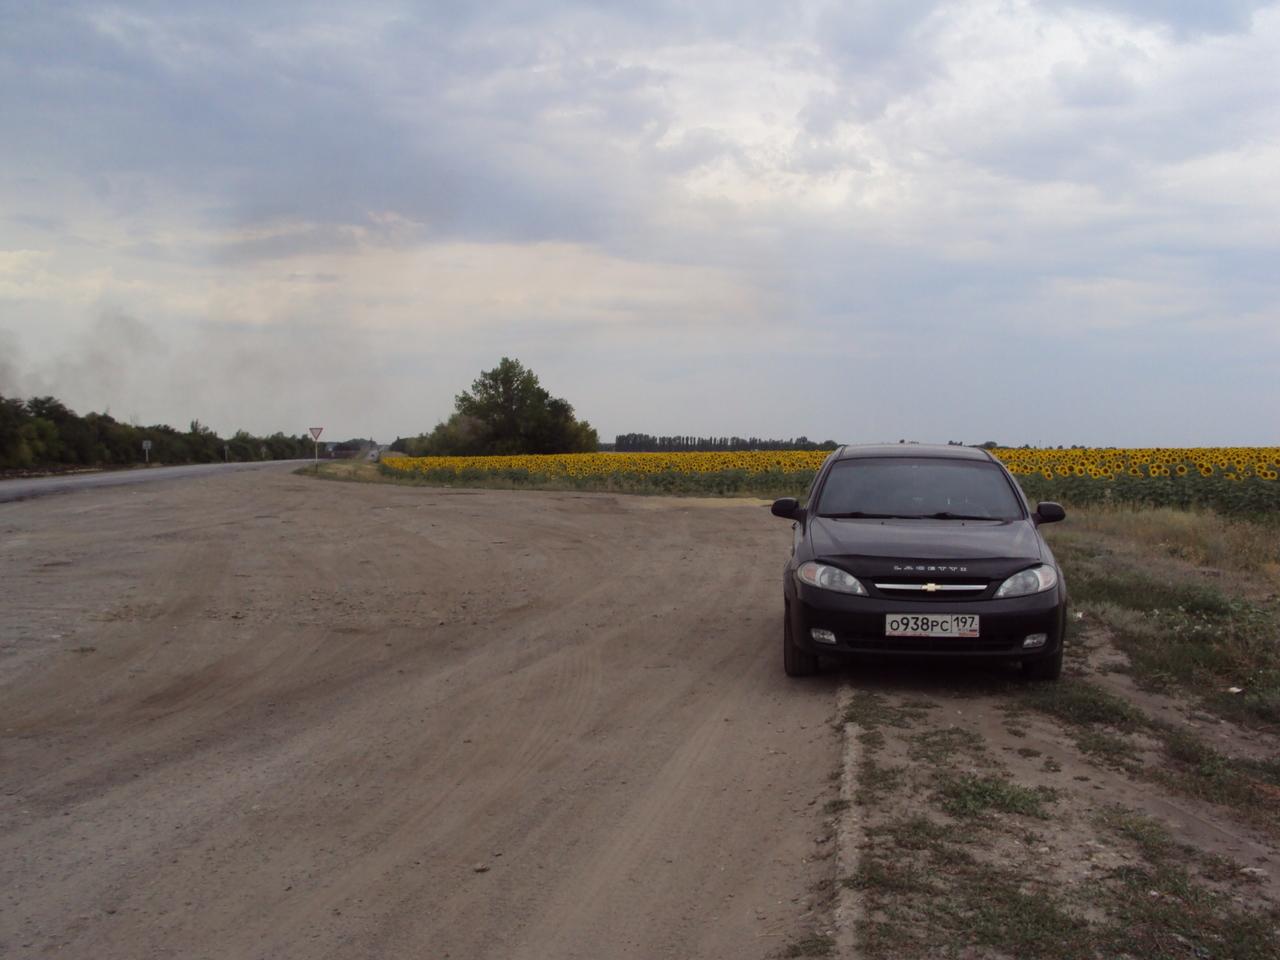 По пути в Волгодонск (остановка в поле с подсолнухами)